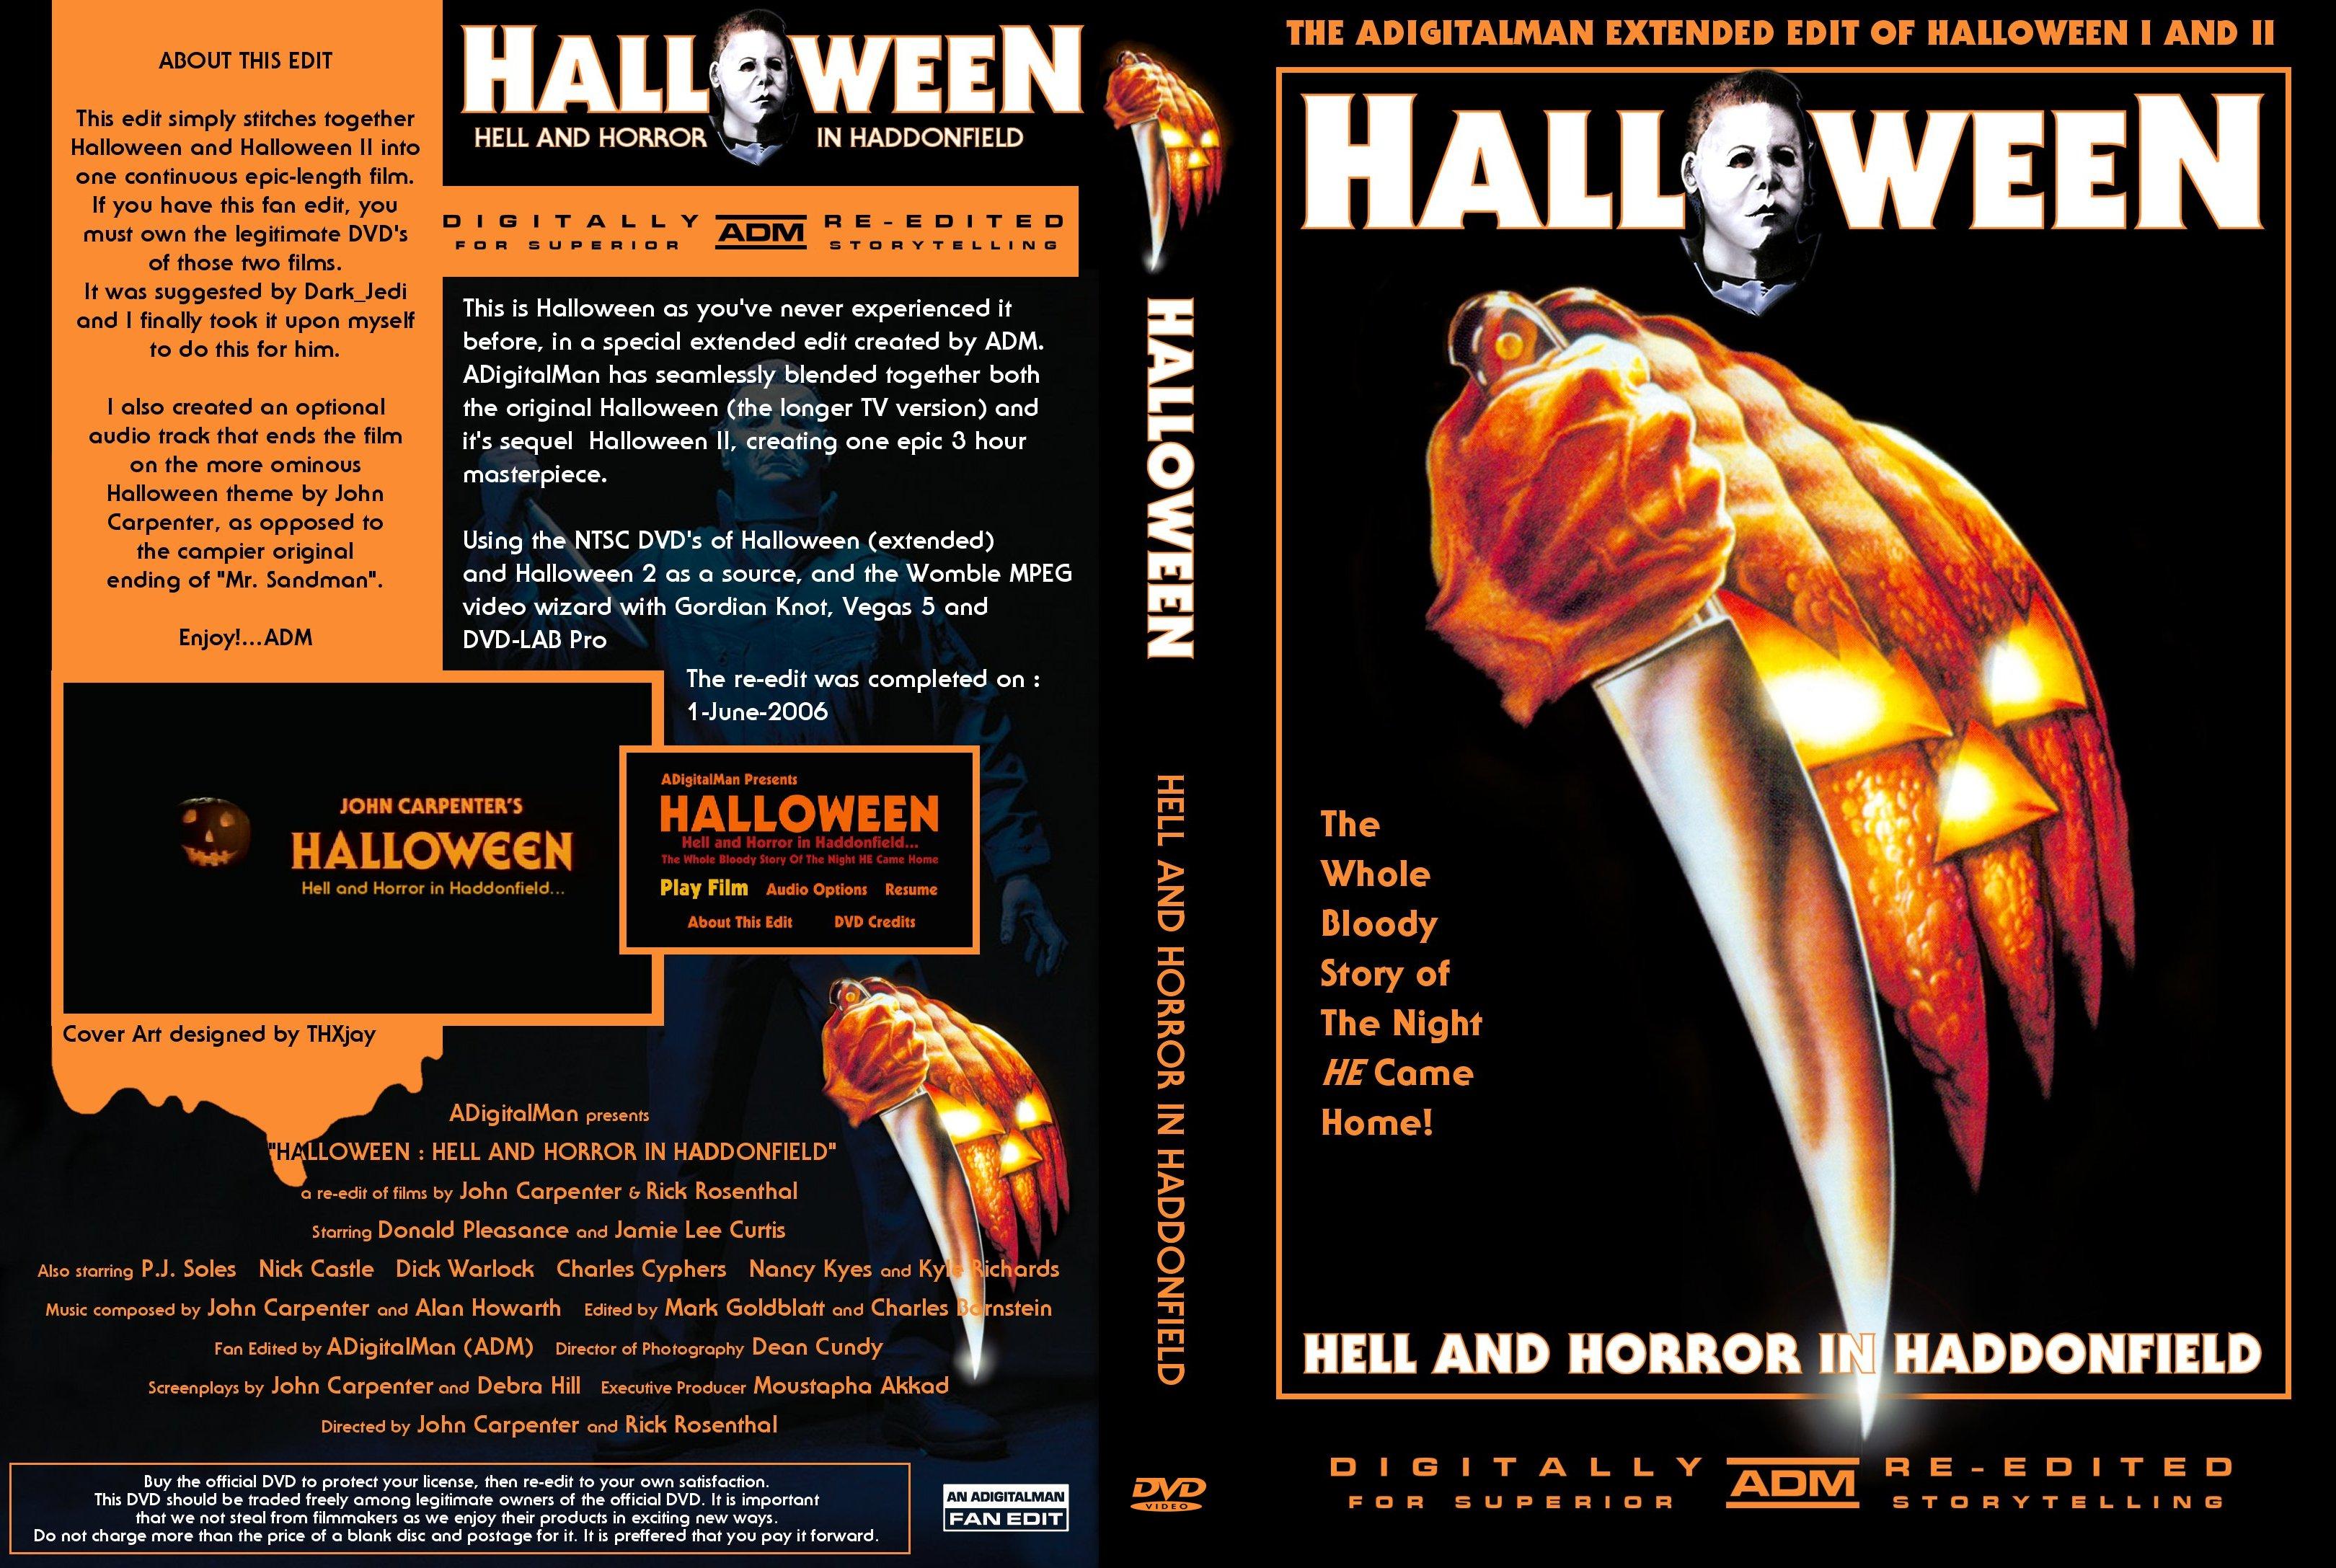 8 Ultimate Must-Watch Halloween Films